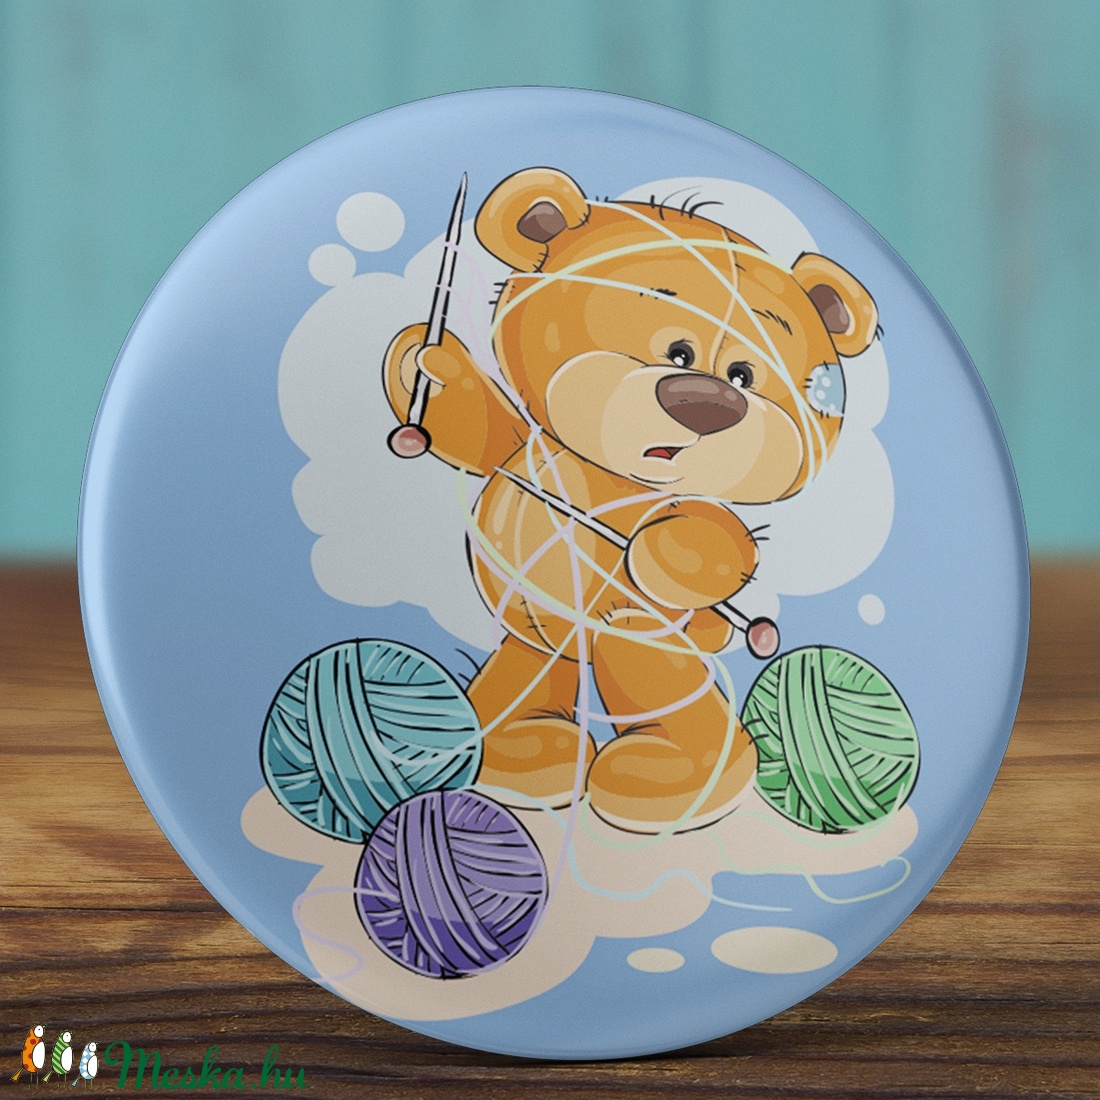 Kötős maci tükör - kötött zsebtükör - maci  tükör - medve tükör - cuki ajándék - maci - fonal - kötőtű - fiú - lány (AngelPin) - Meska.hu